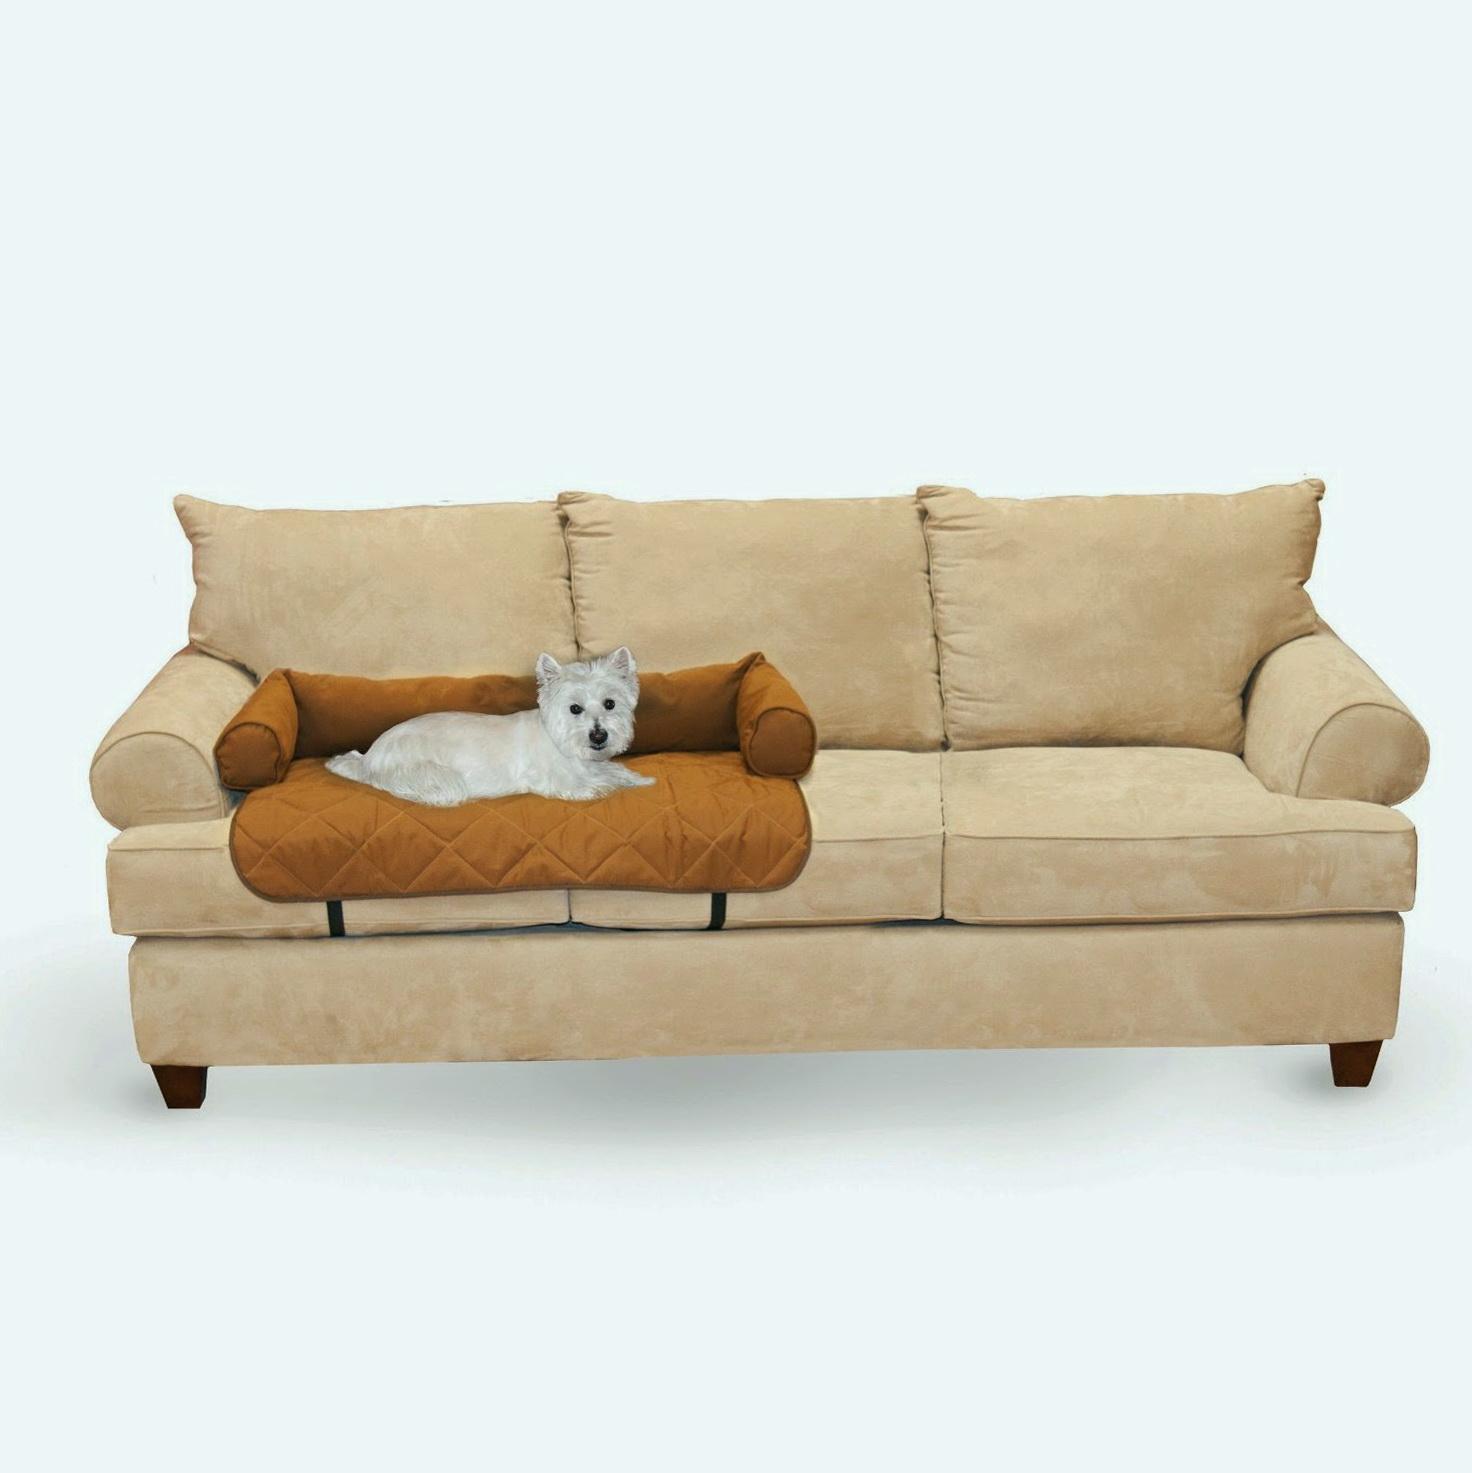 T cushion sofa slipcovers amazon home design ideas for Sofa exterior amazon